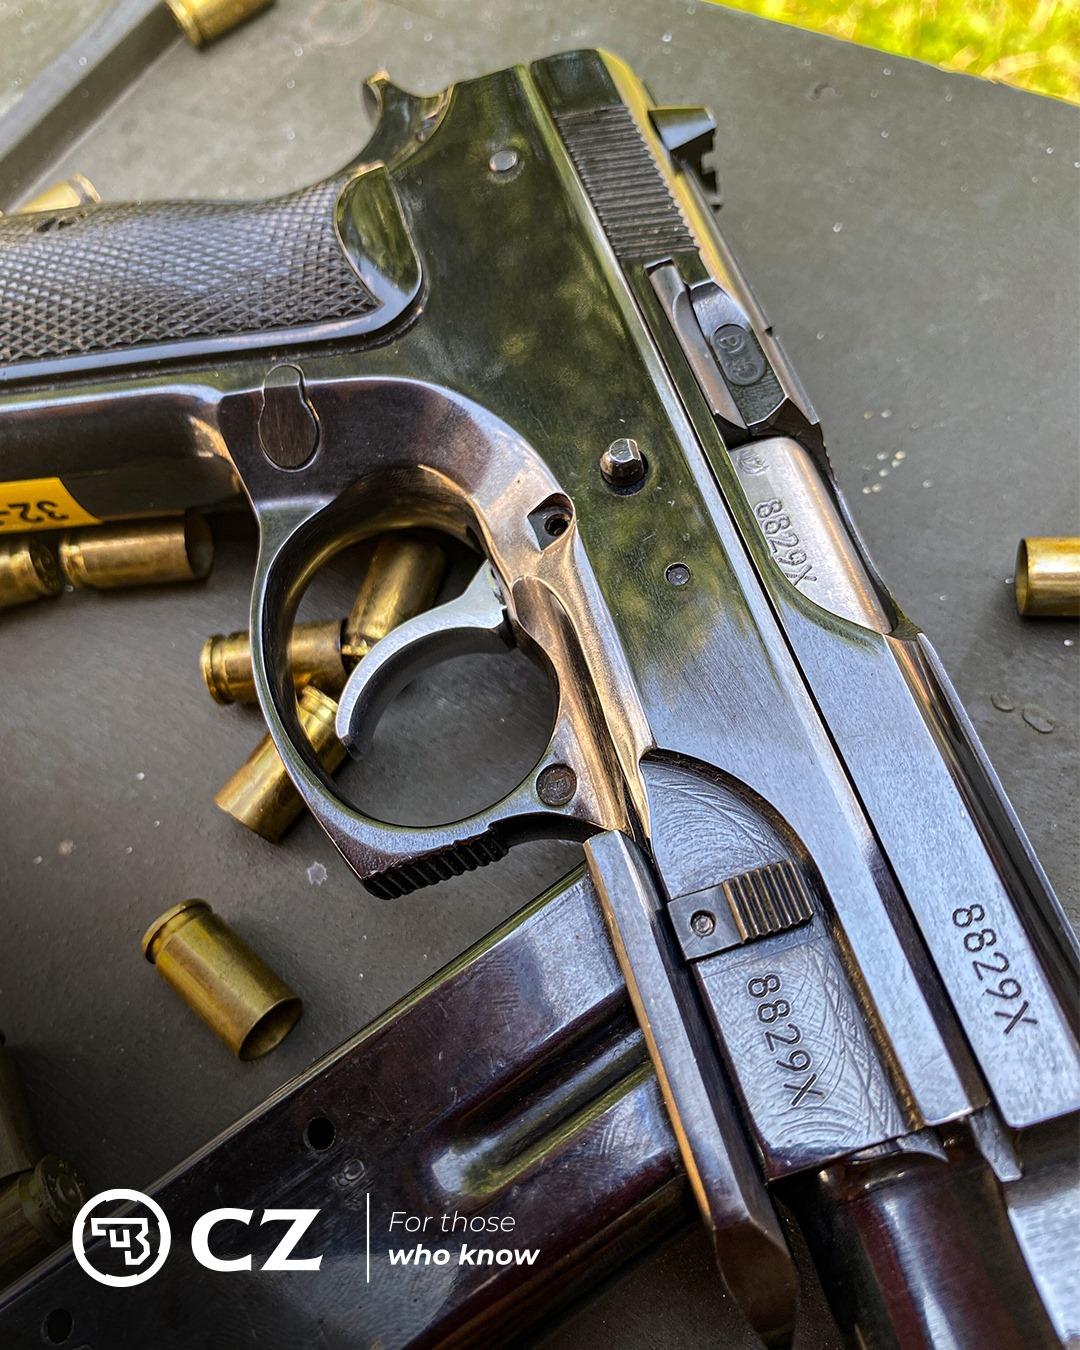 CZ-75 Automatic,